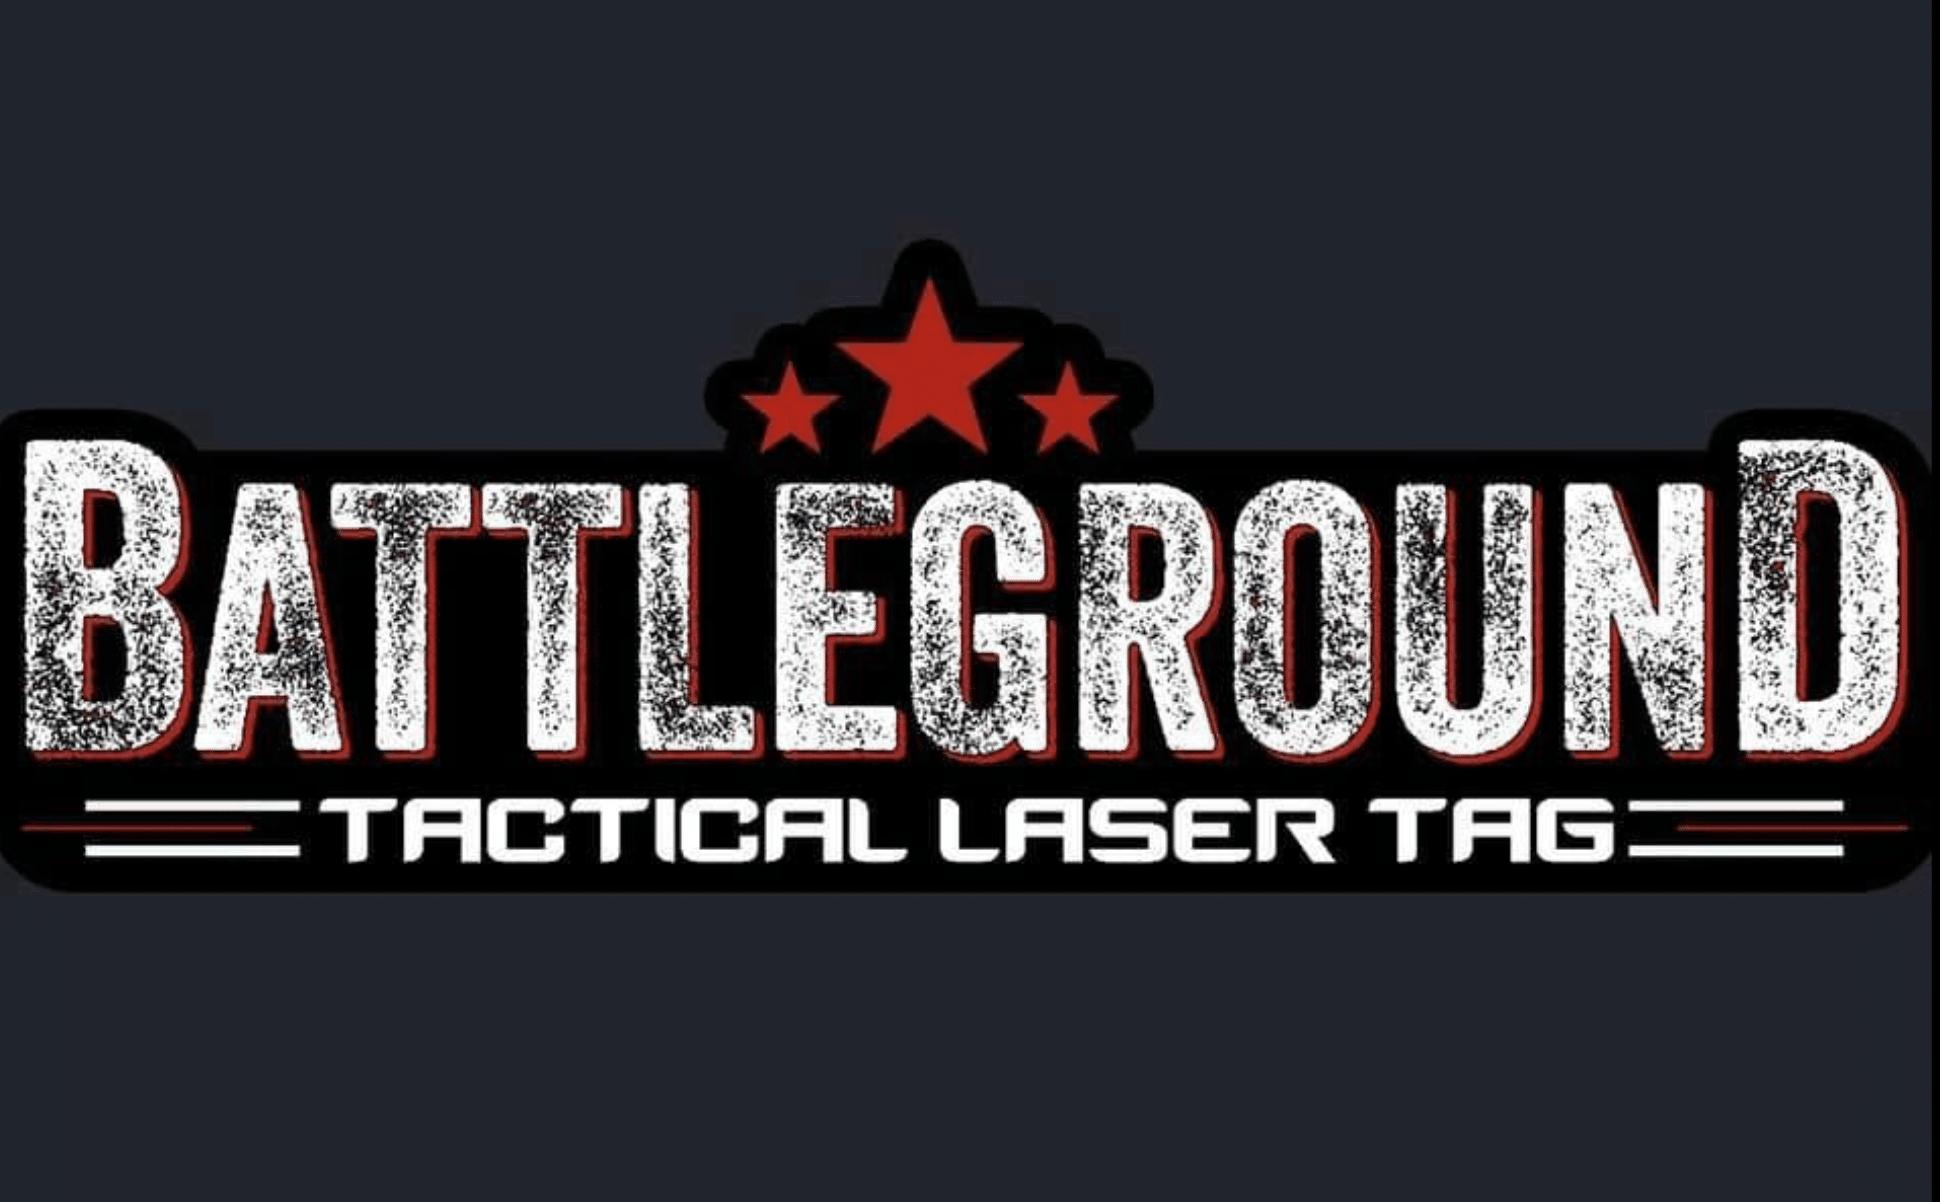 Battleground Tactical Laser Tag - Pigeon Forge, TN